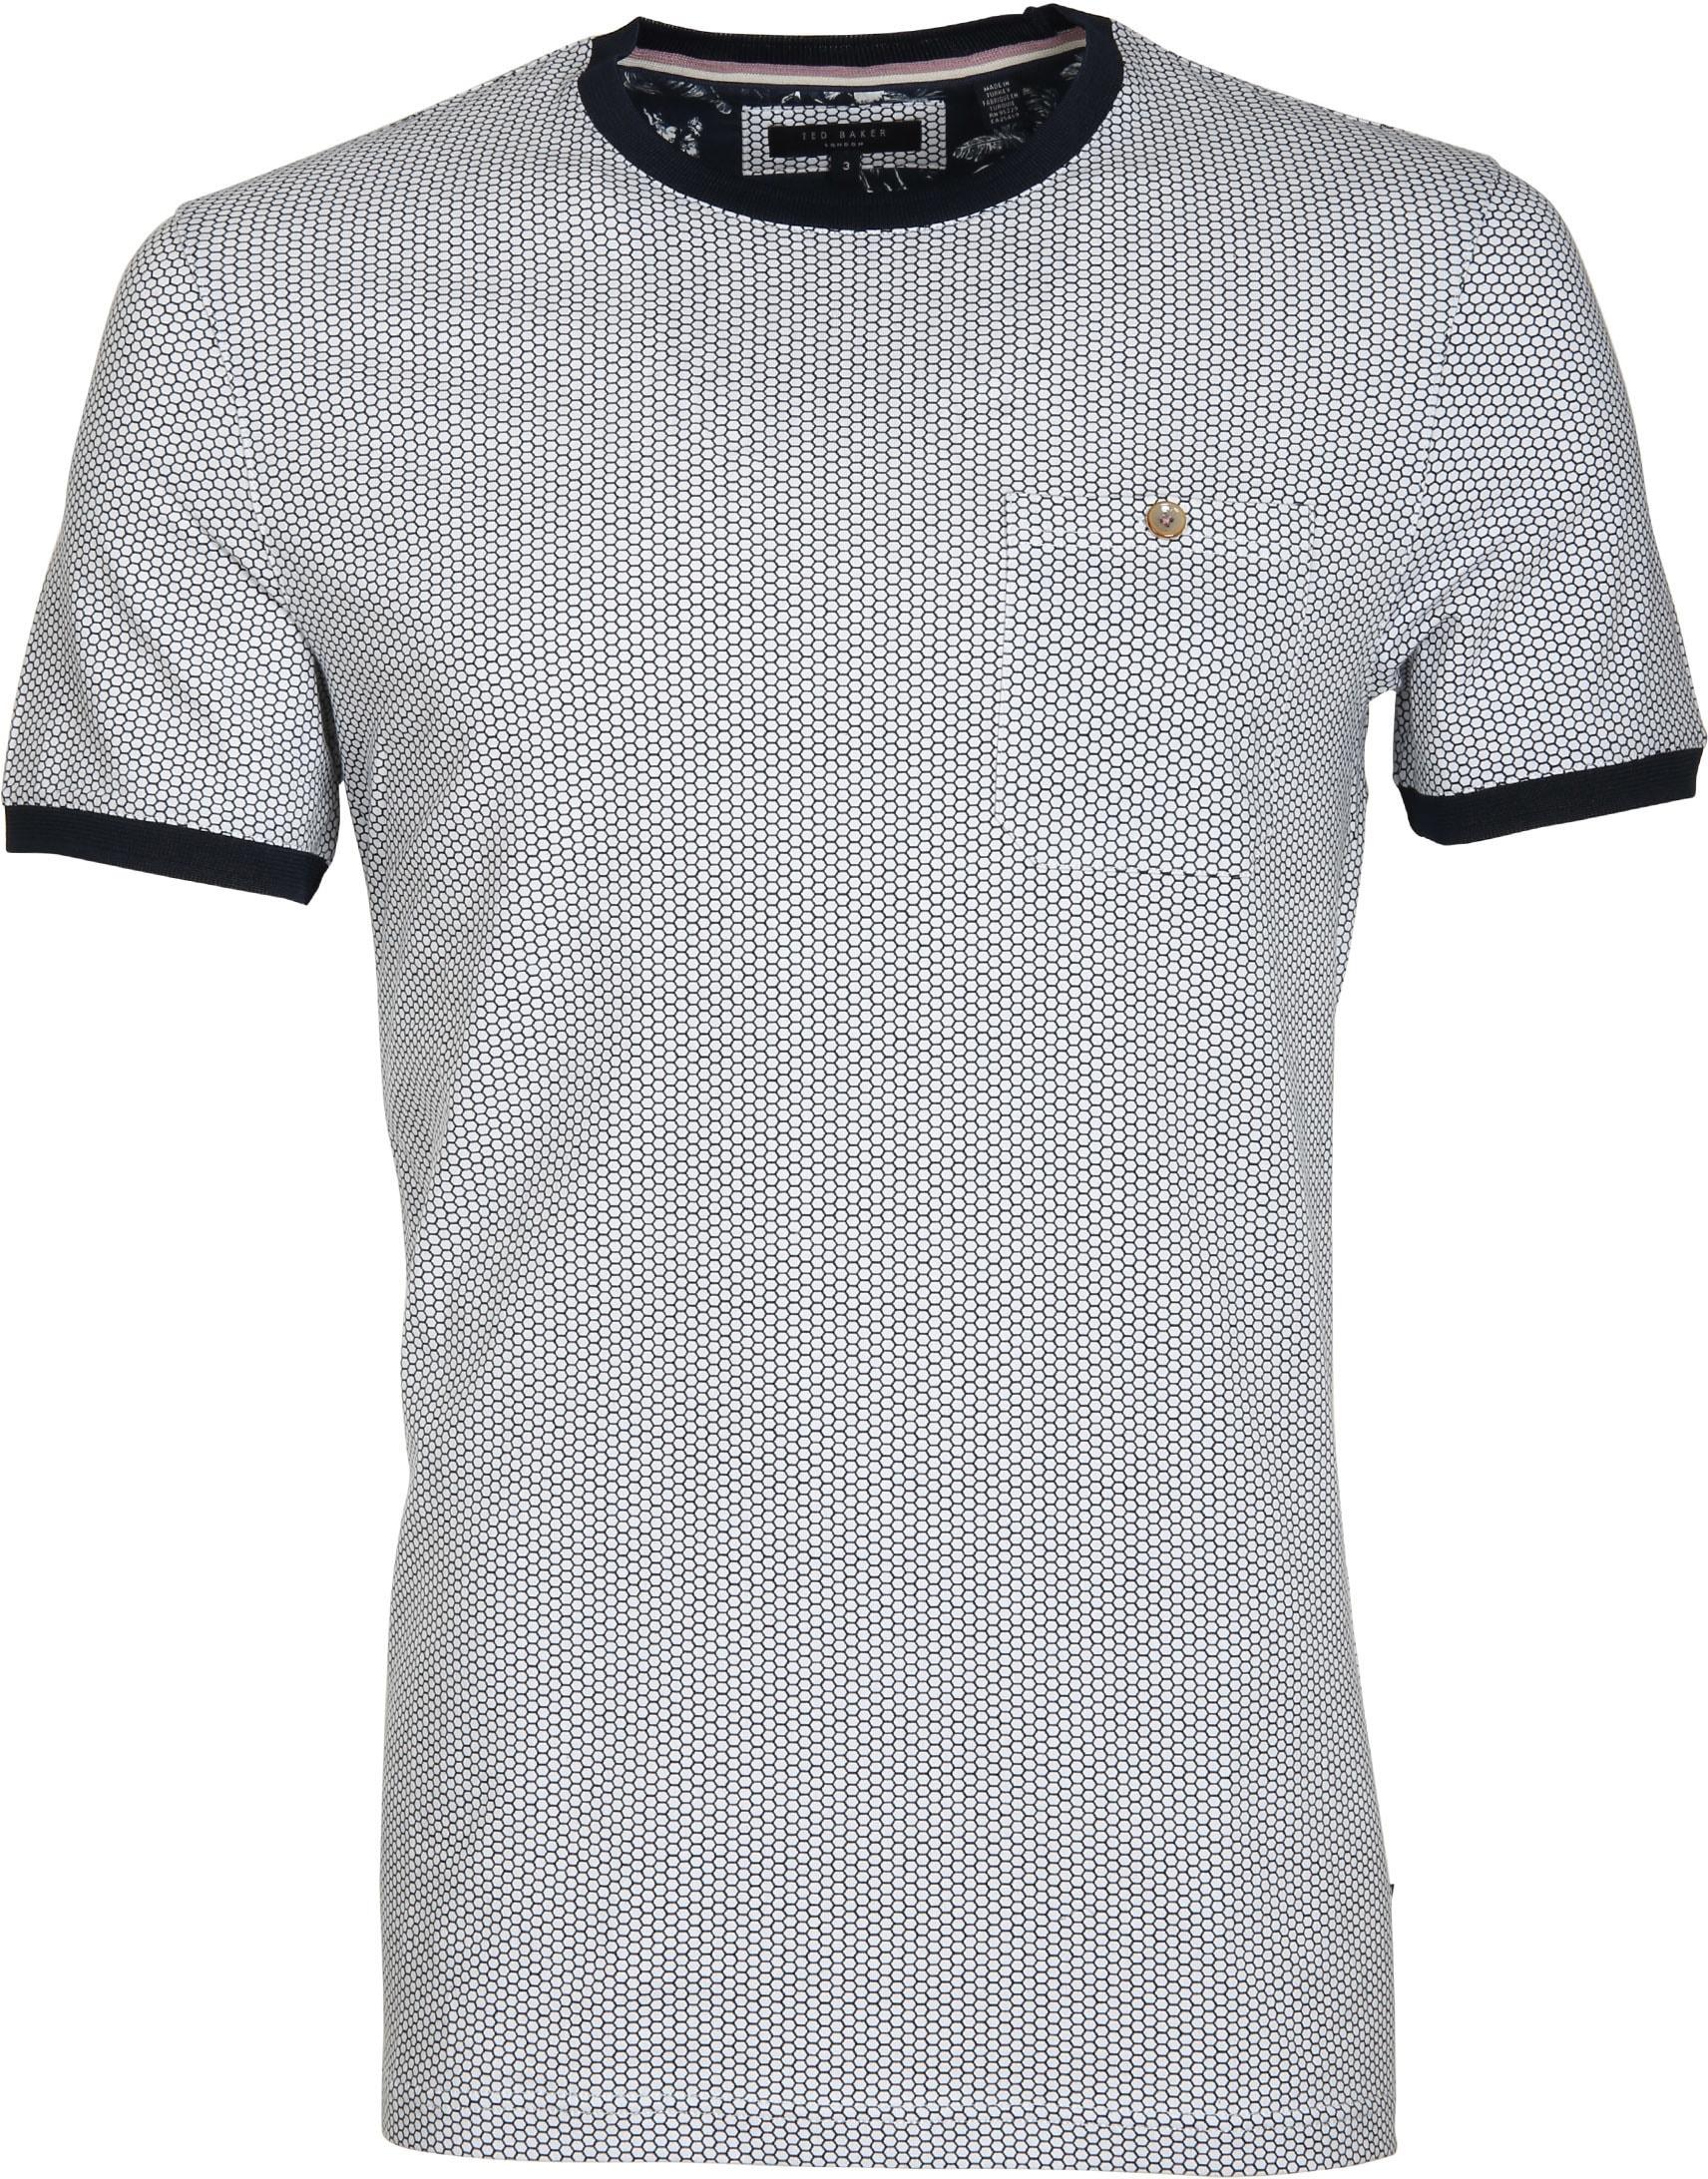 Ted Baker T-Shirt Honinggraat foto 0